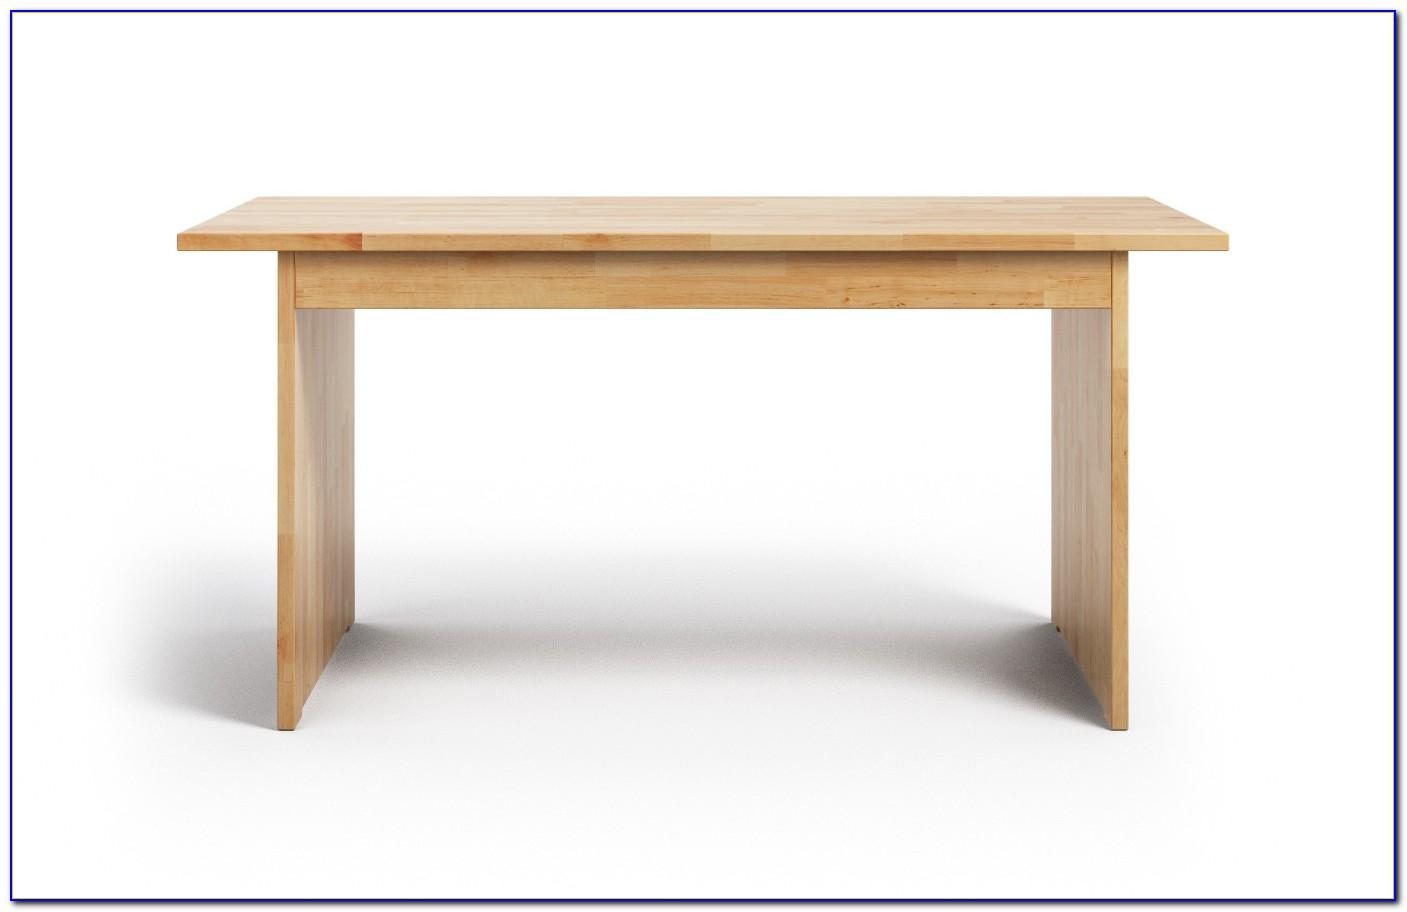 Schreibtisch Erle Geölt